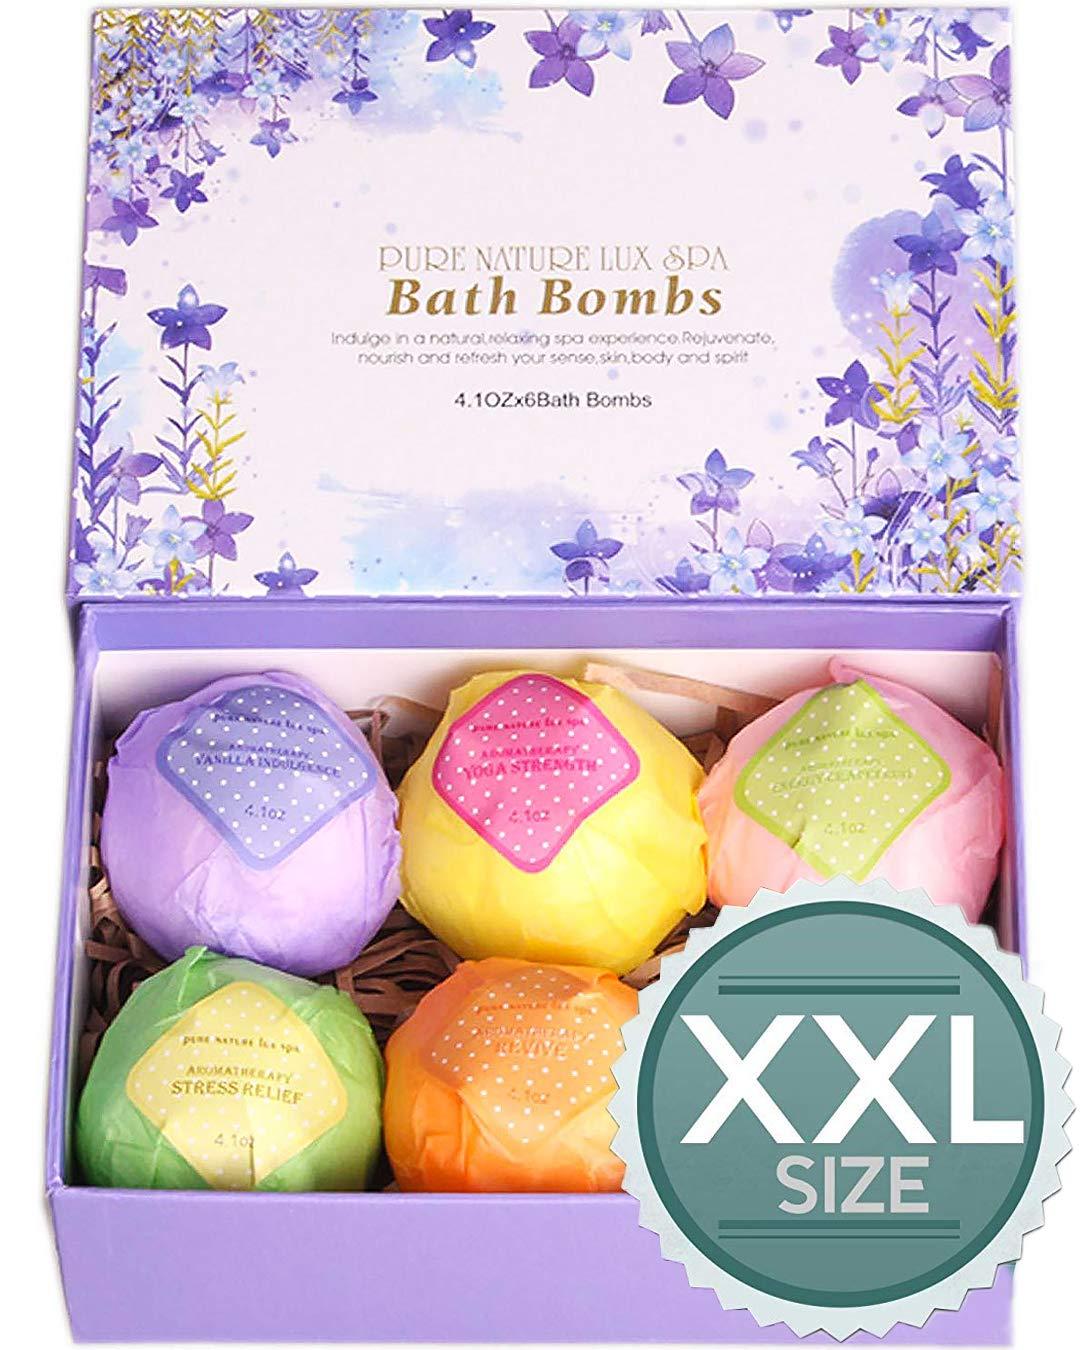 Bath Bombs Gift Set - Roommate Gift Ideas